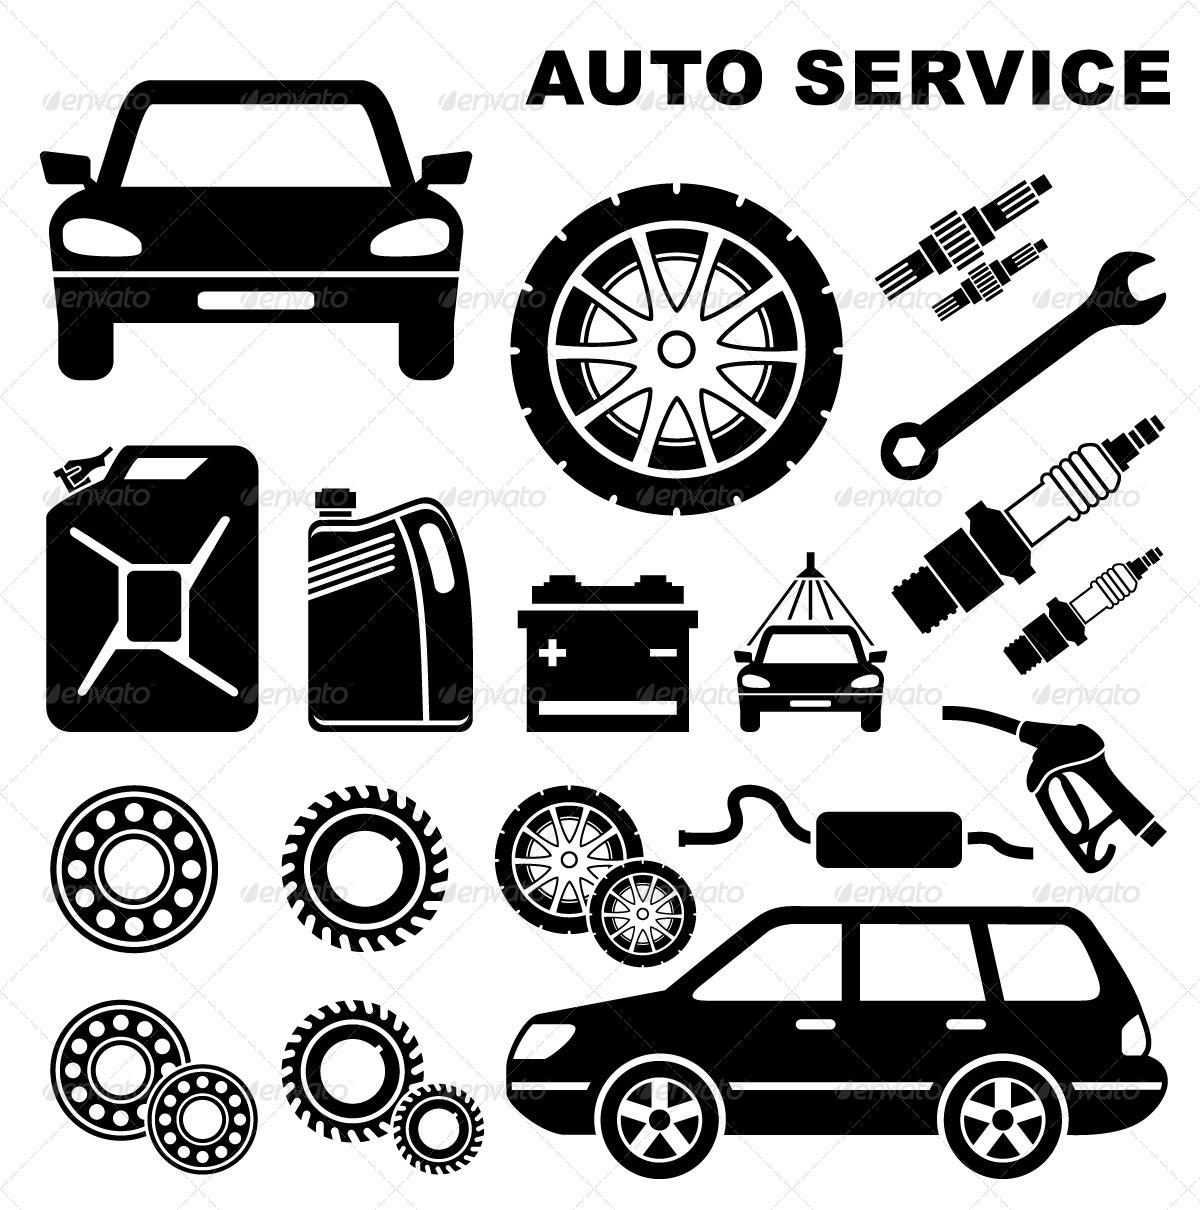 car repair service icon graphicriver. Black Bedroom Furniture Sets. Home Design Ideas